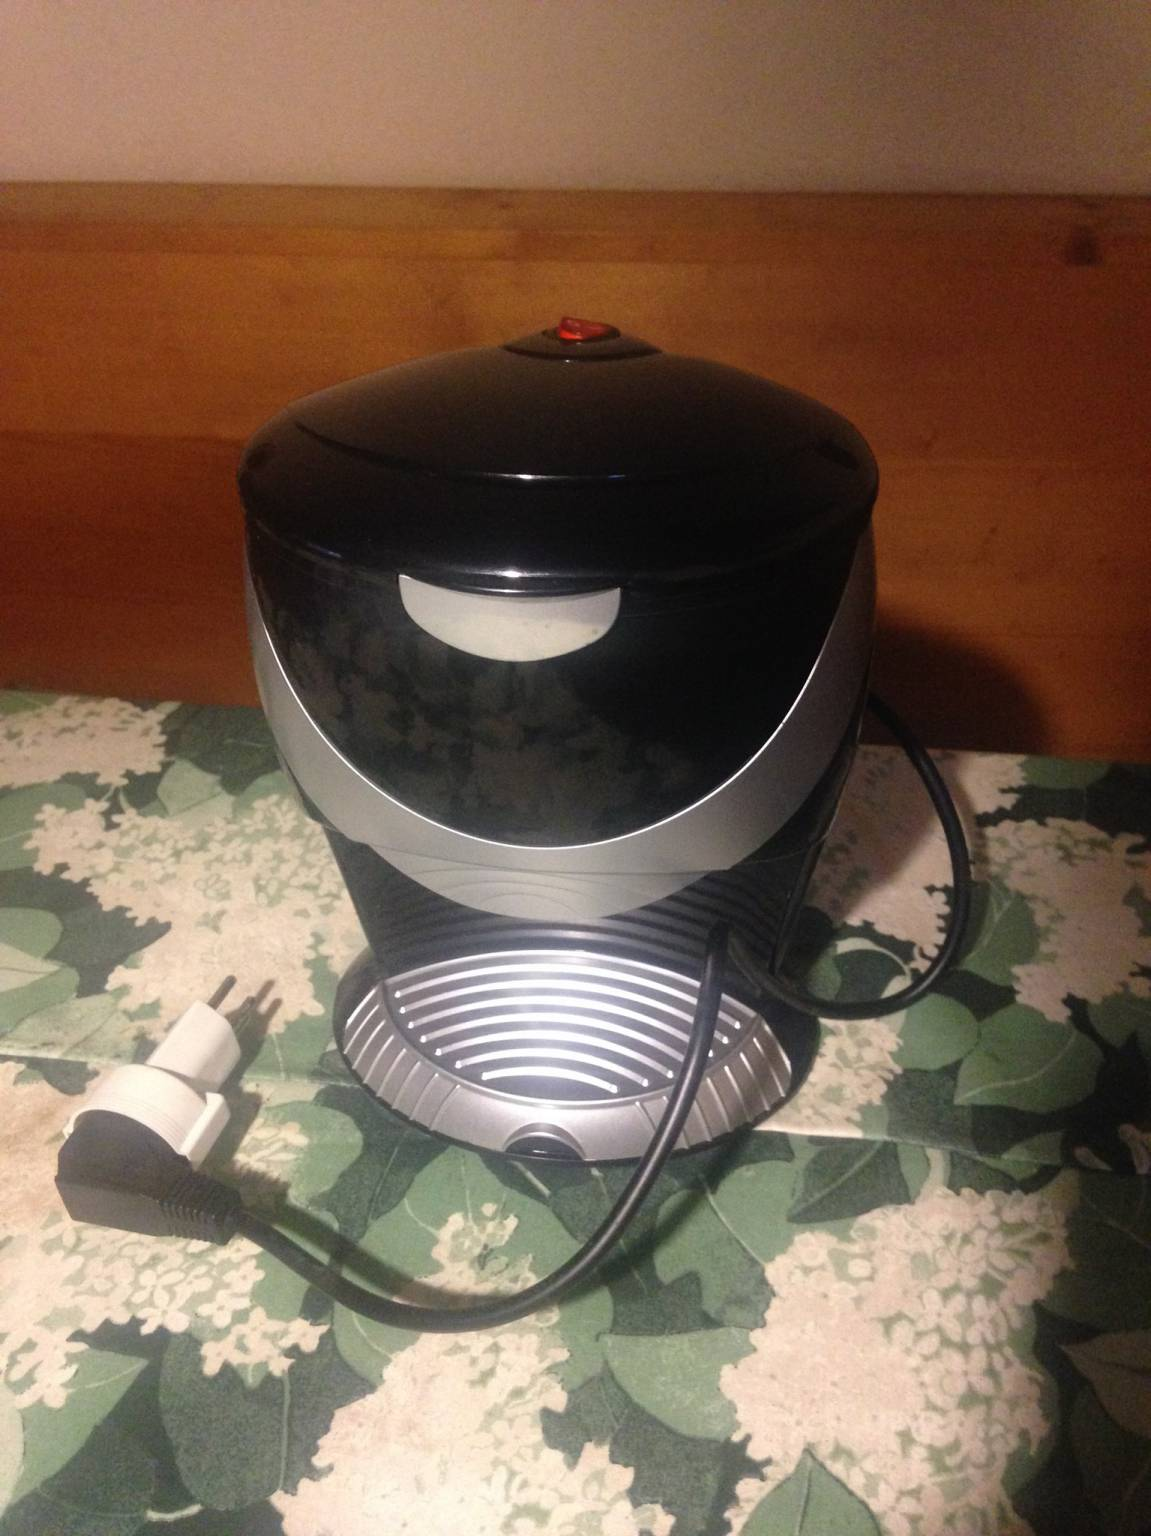 2 tassen dauerfilter kaffeemaschine filtermaschinen. Black Bedroom Furniture Sets. Home Design Ideas